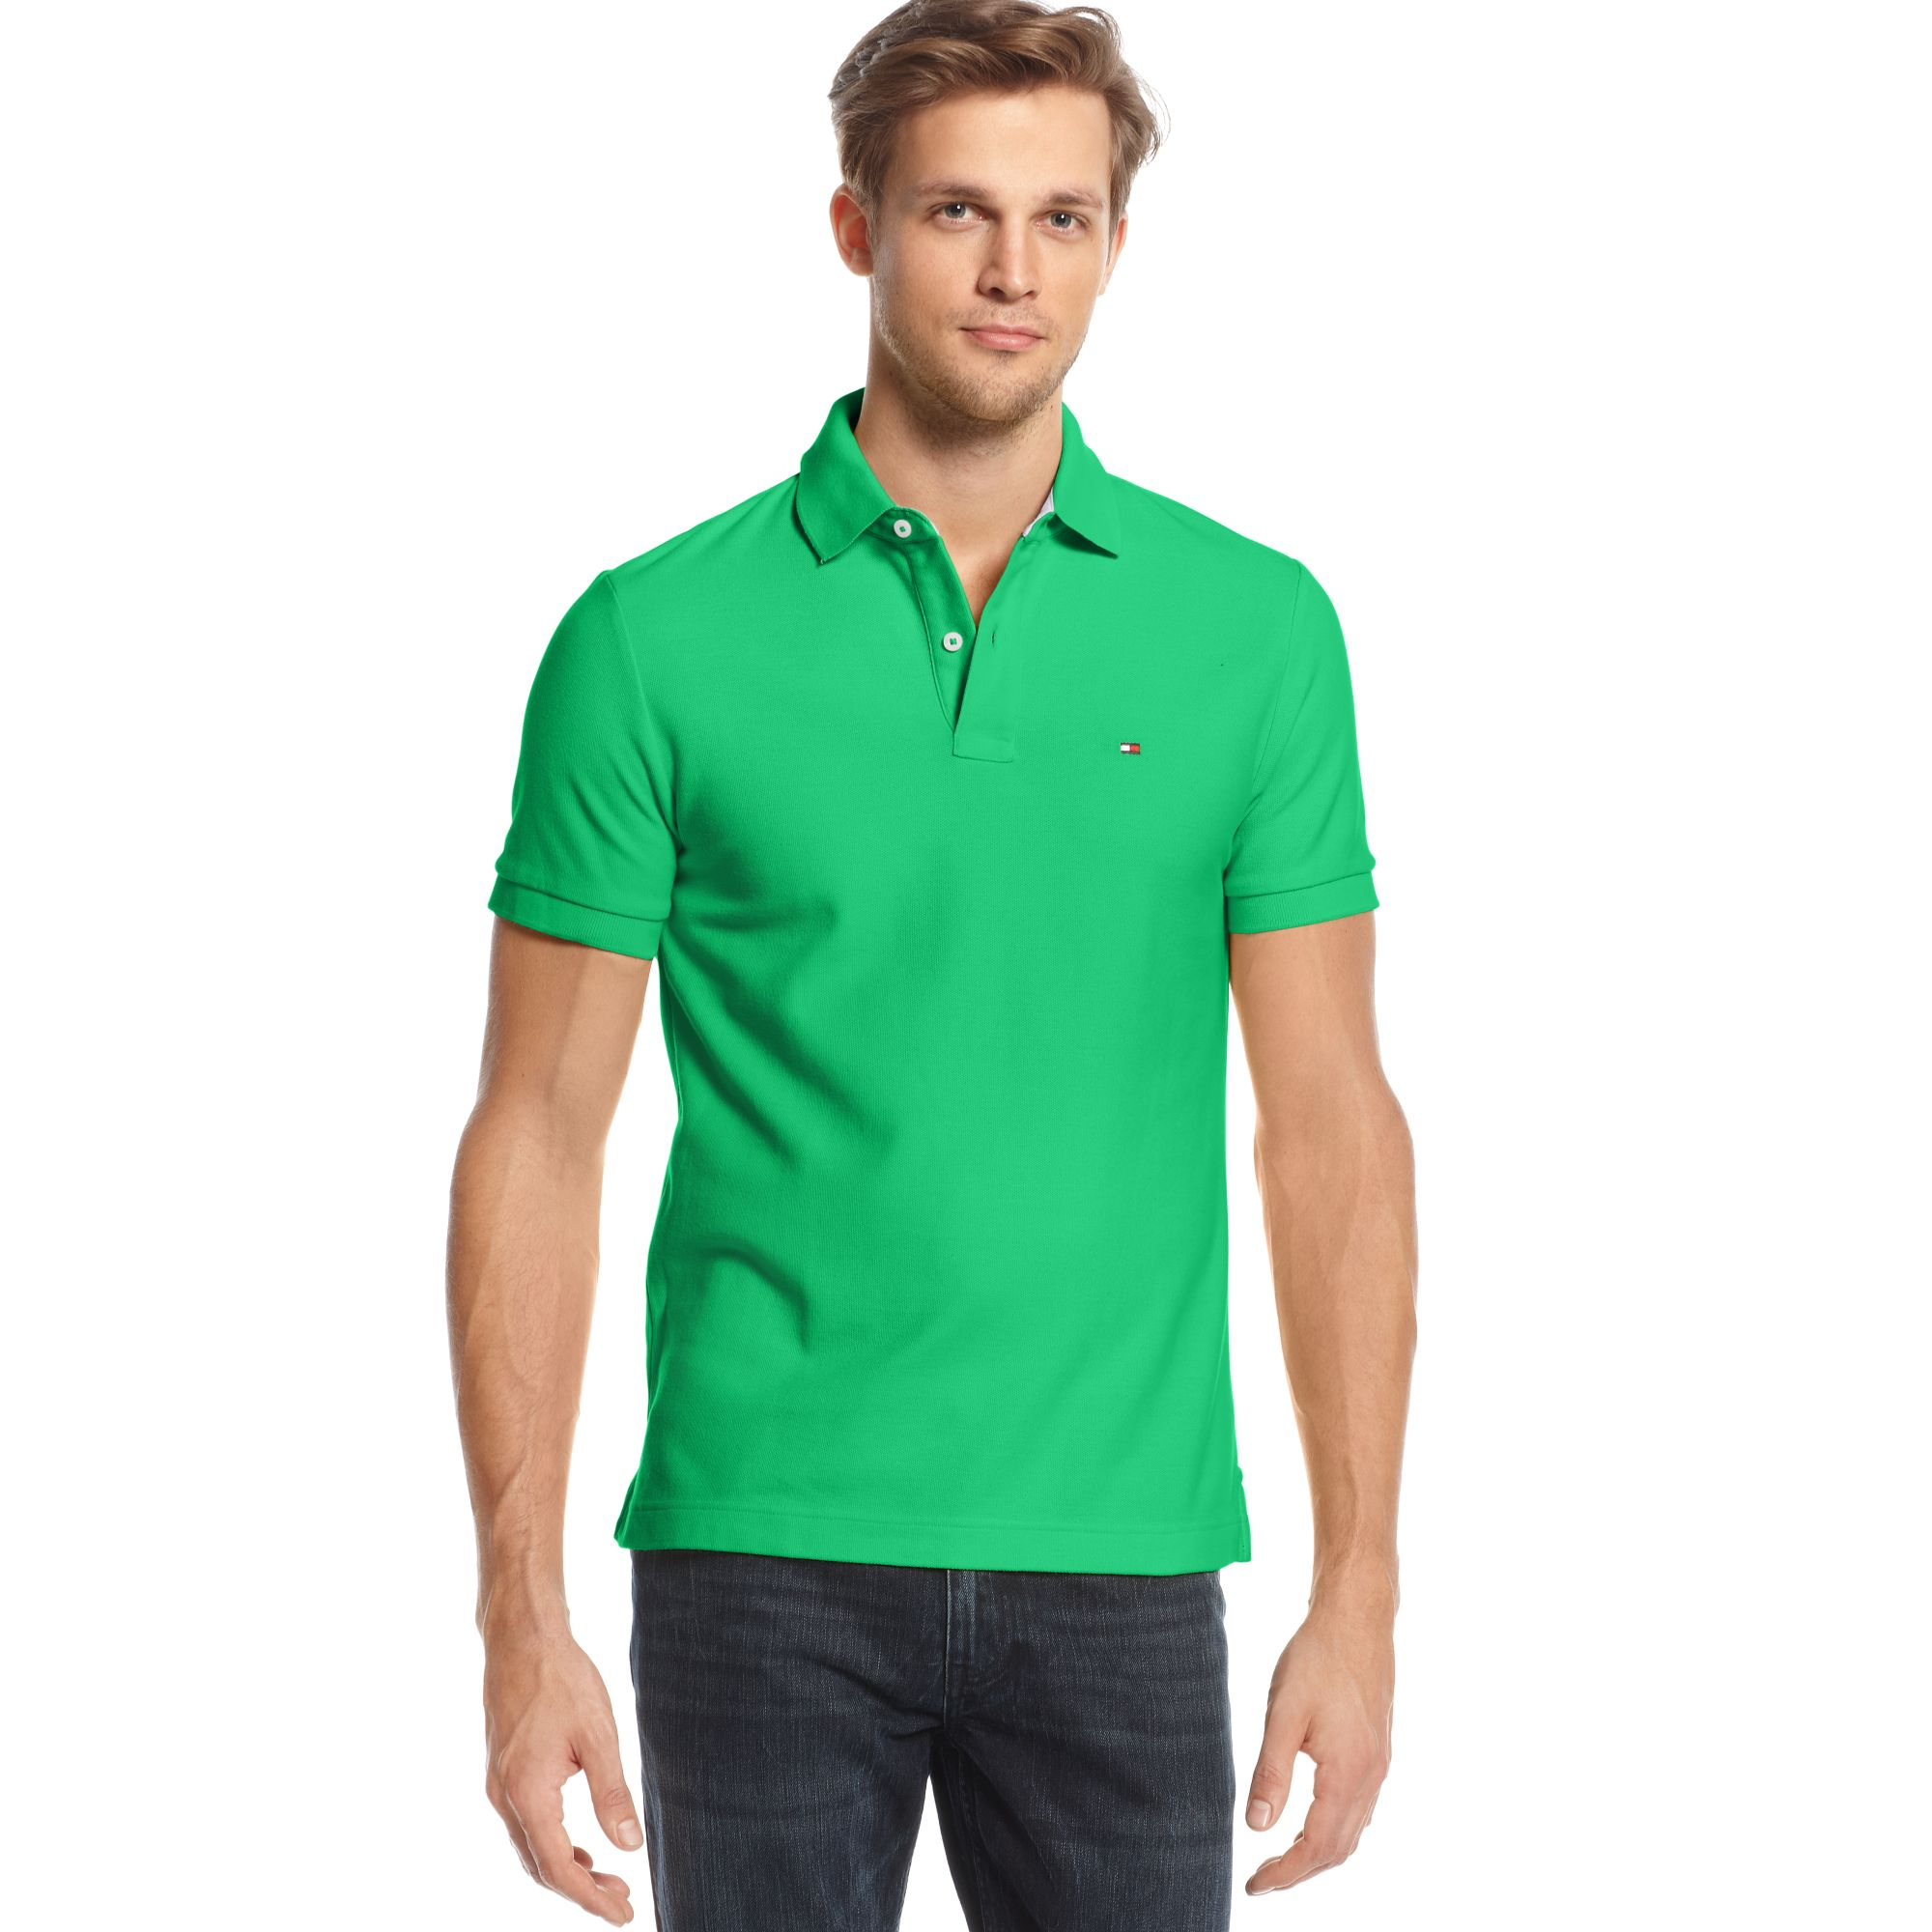 lyst tommy hilfiger slim fit ivy polo shirt in green for men. Black Bedroom Furniture Sets. Home Design Ideas